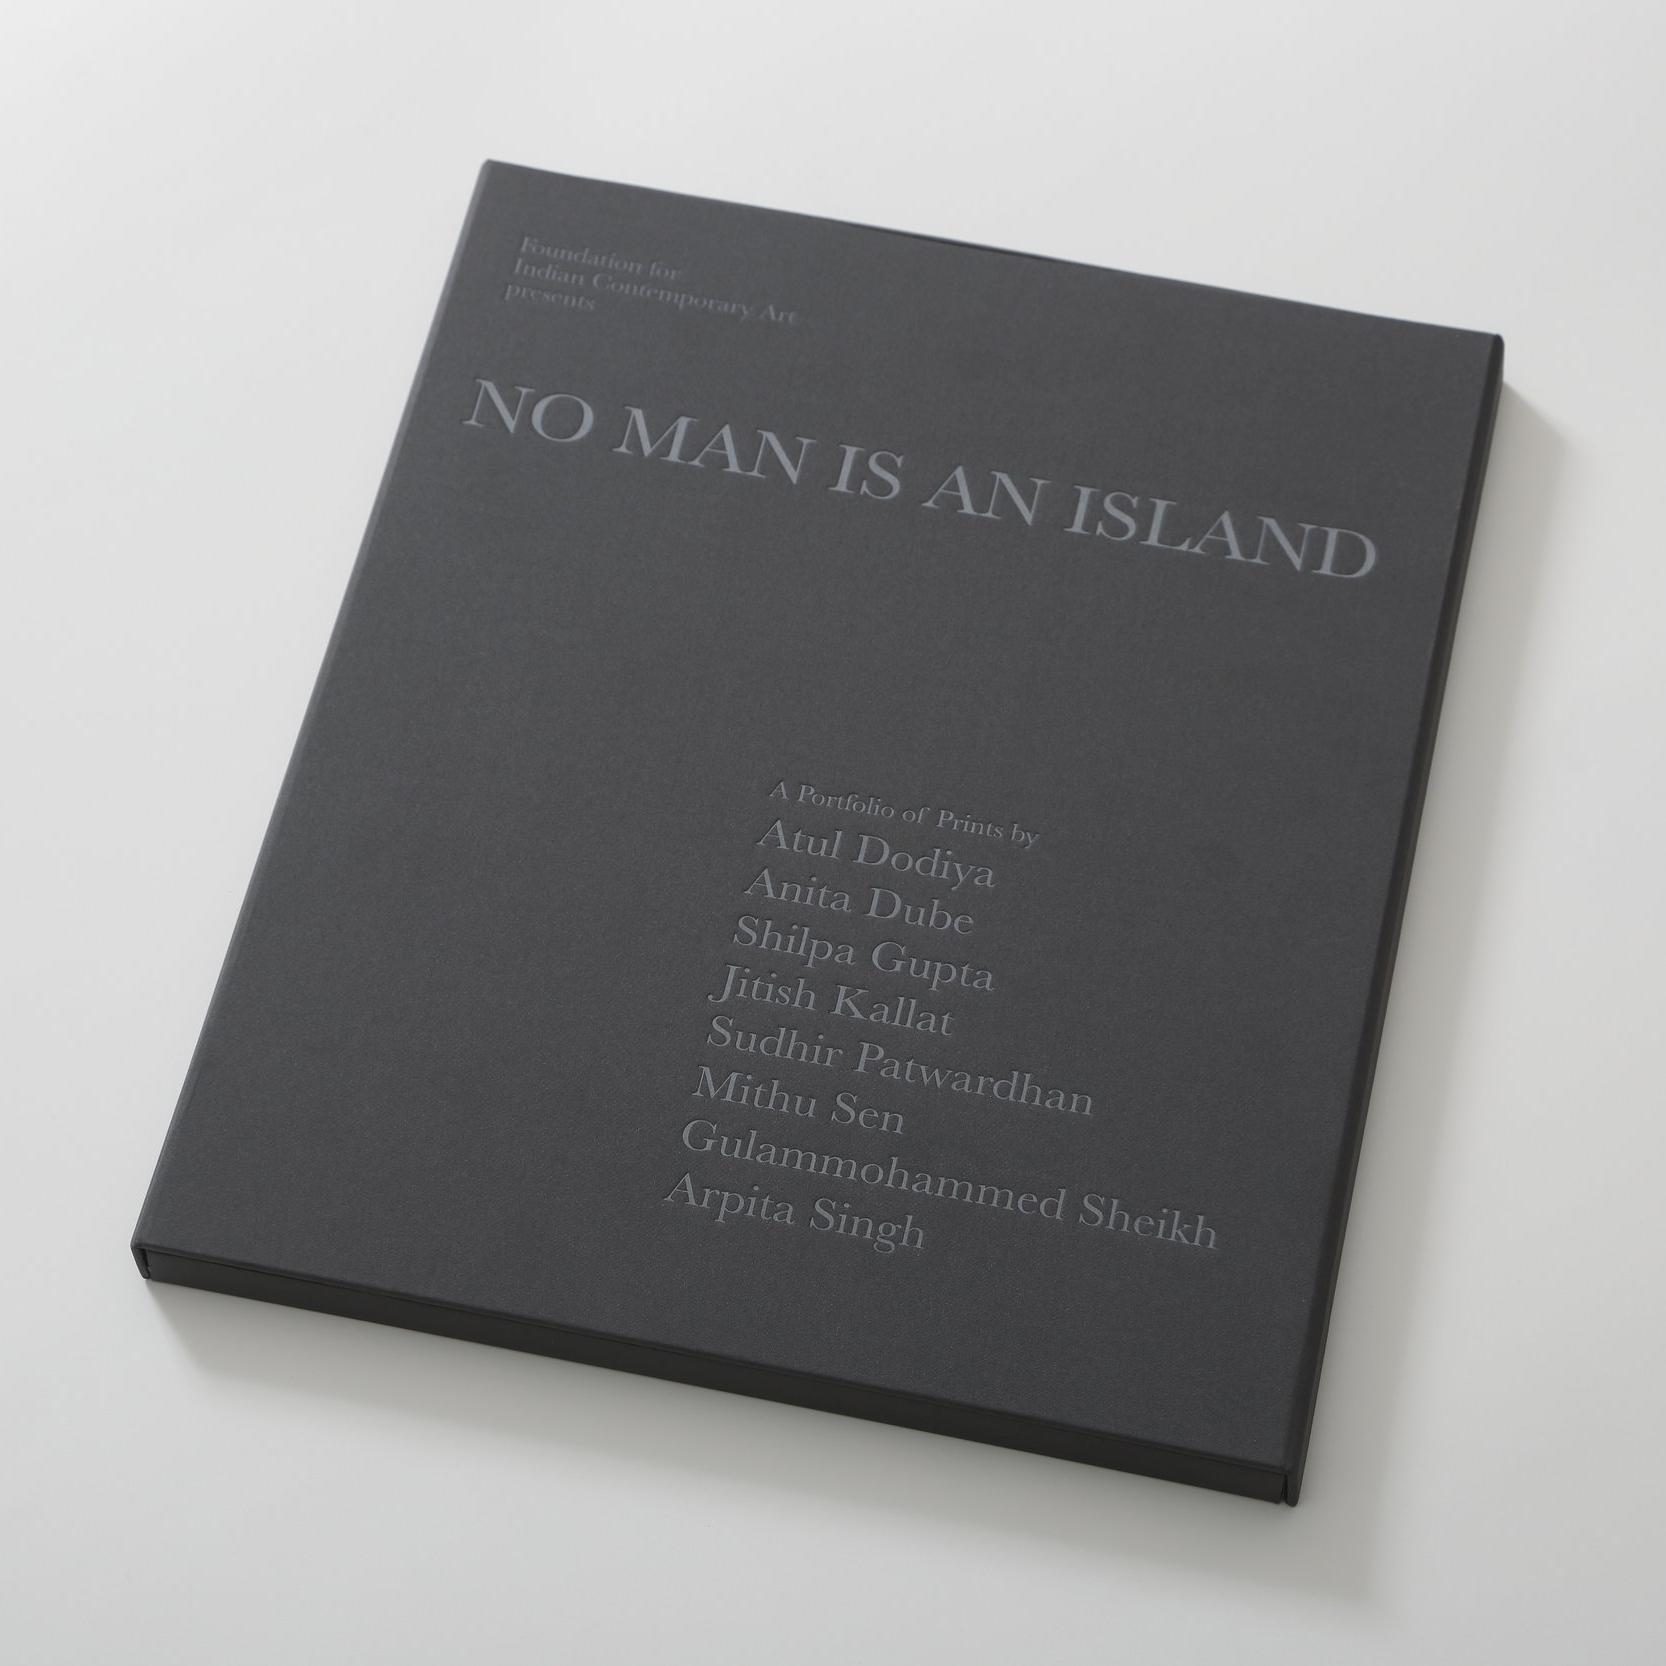 NO MAN IS AN ISLAND: A PORTFOLIO OF PRINTS